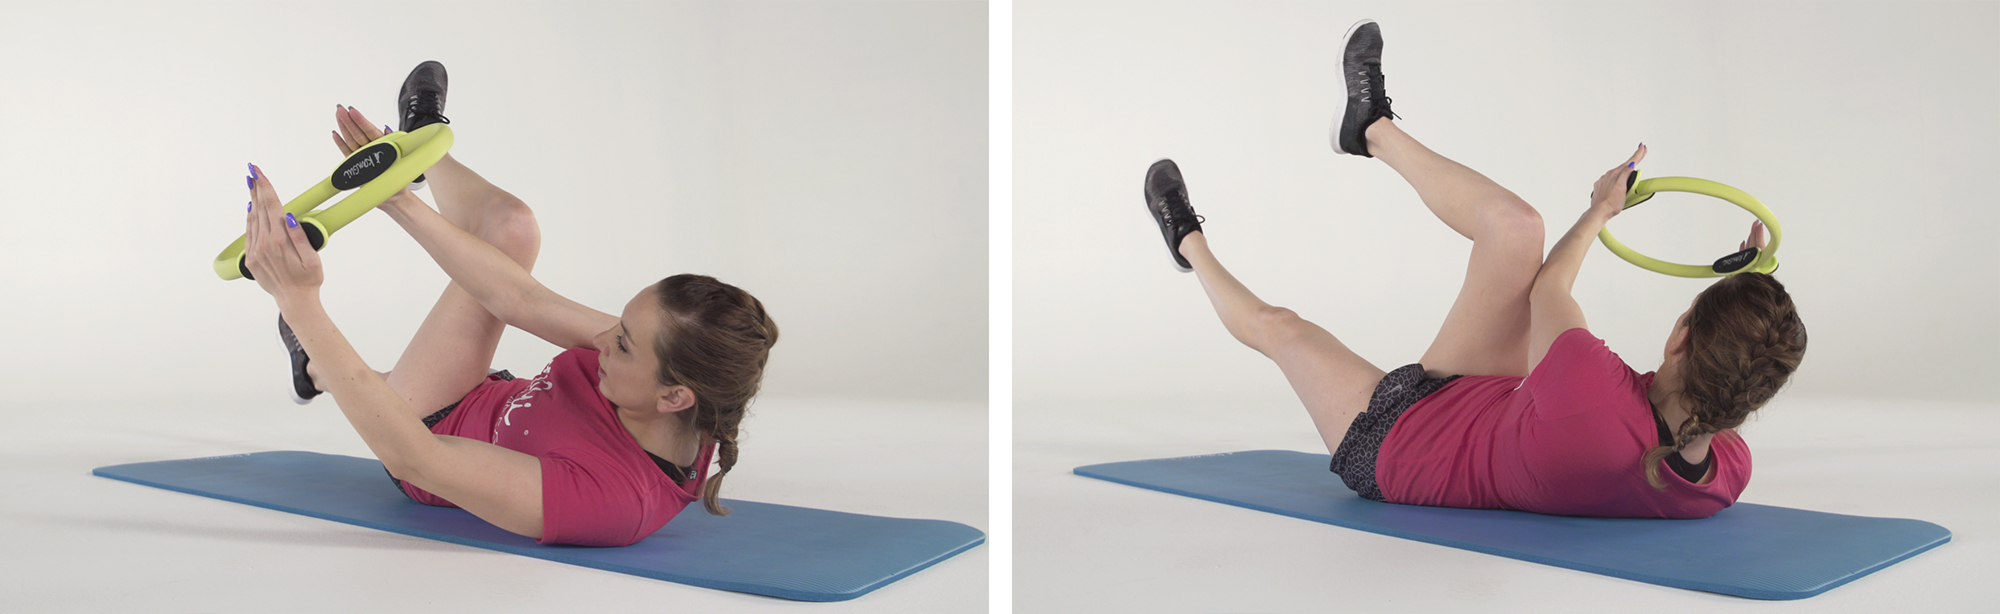 CRUNCH OBLIQUE ventre plat exercice fitness